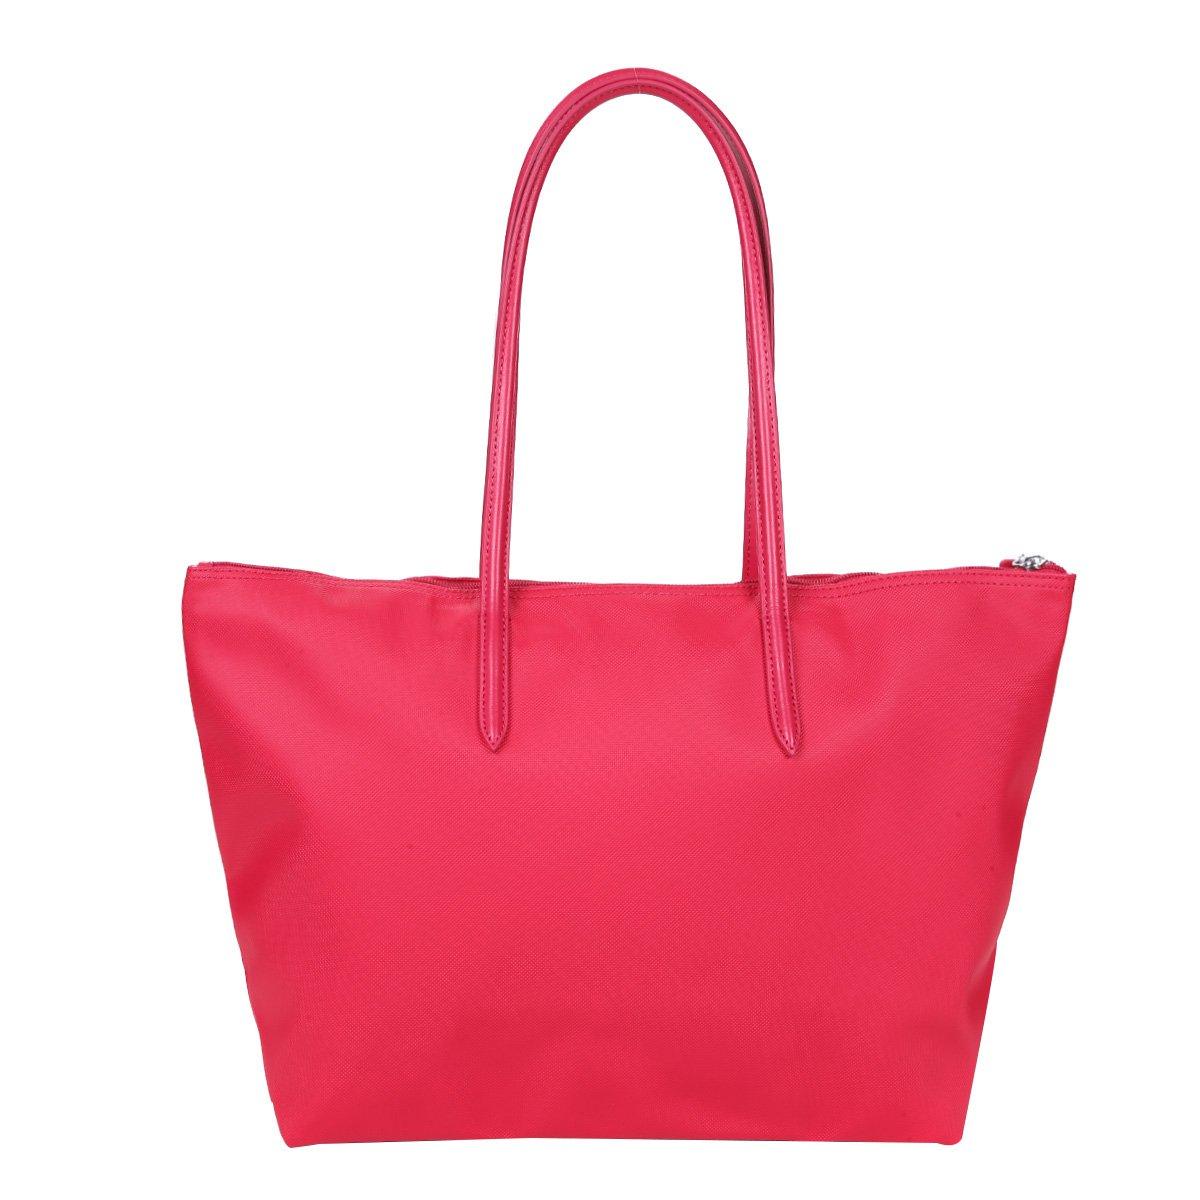 Bolsa Lacoste Shopper Clássica Feminina - Compre Agora   Zattini 6acb8e0625